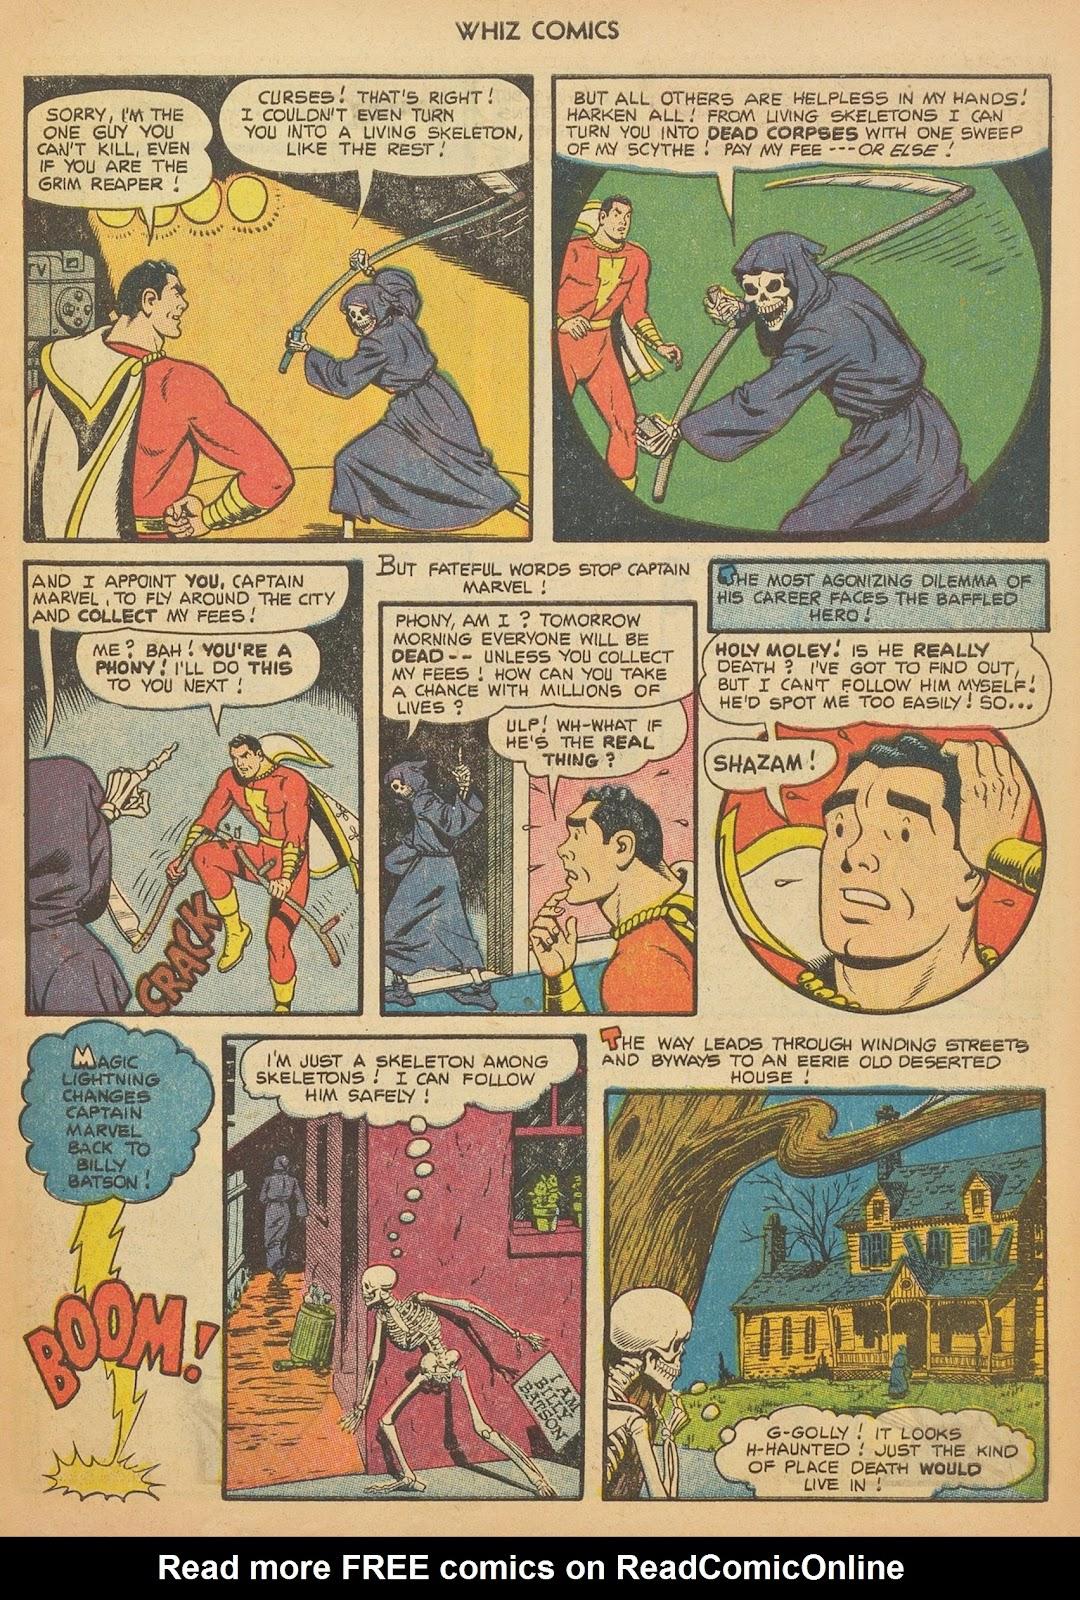 Read online WHIZ Comics comic -  Issue #153 - 7